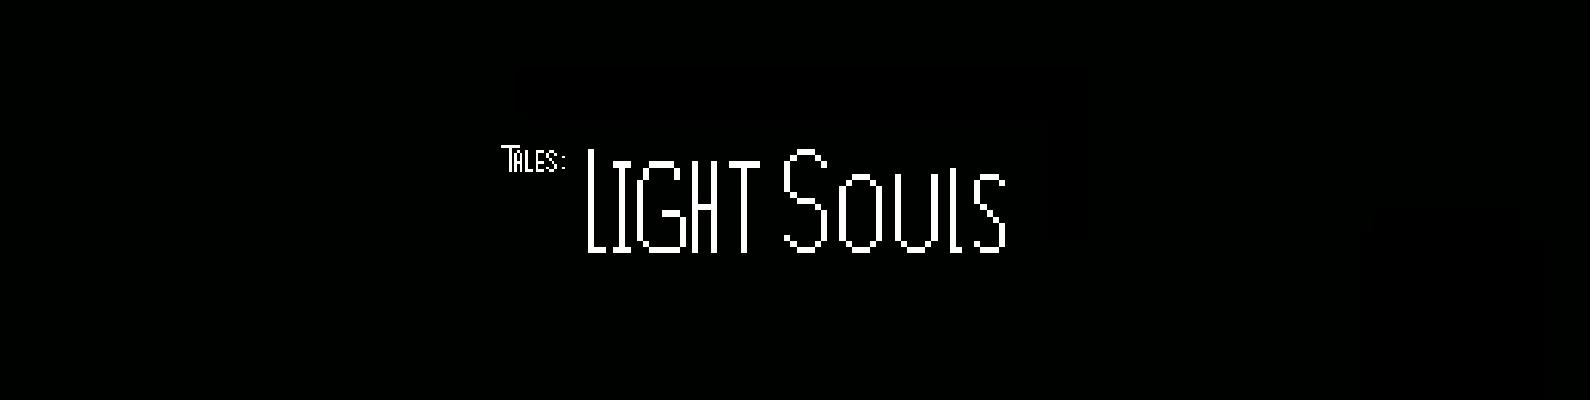 Tales: Light Souls